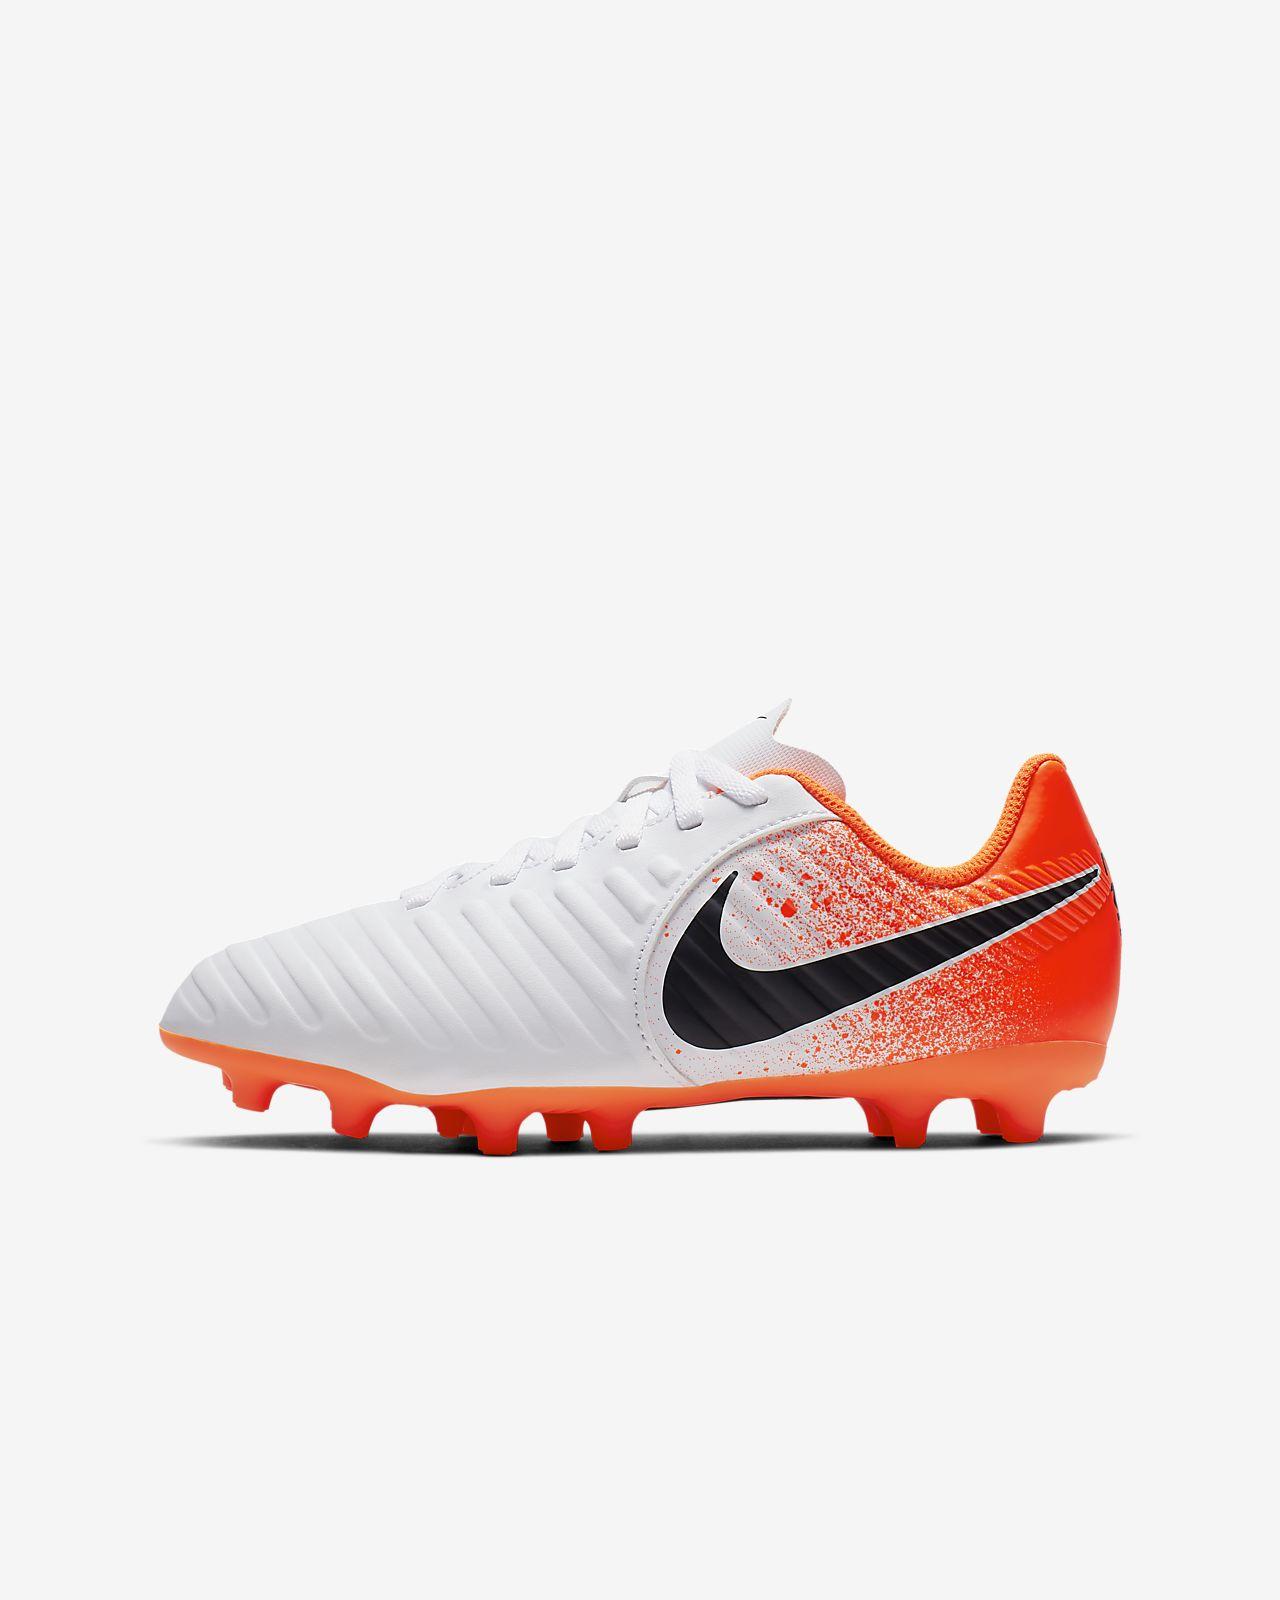 huge discount a4e70 a110e รองเท้าสตั๊ดฟุตบอลเด็กวัยหัดเดิน/เด็กเล็กสำหรับพื้นสนามทั่วไป Nike Jr.  Tiempo Legend VII Club